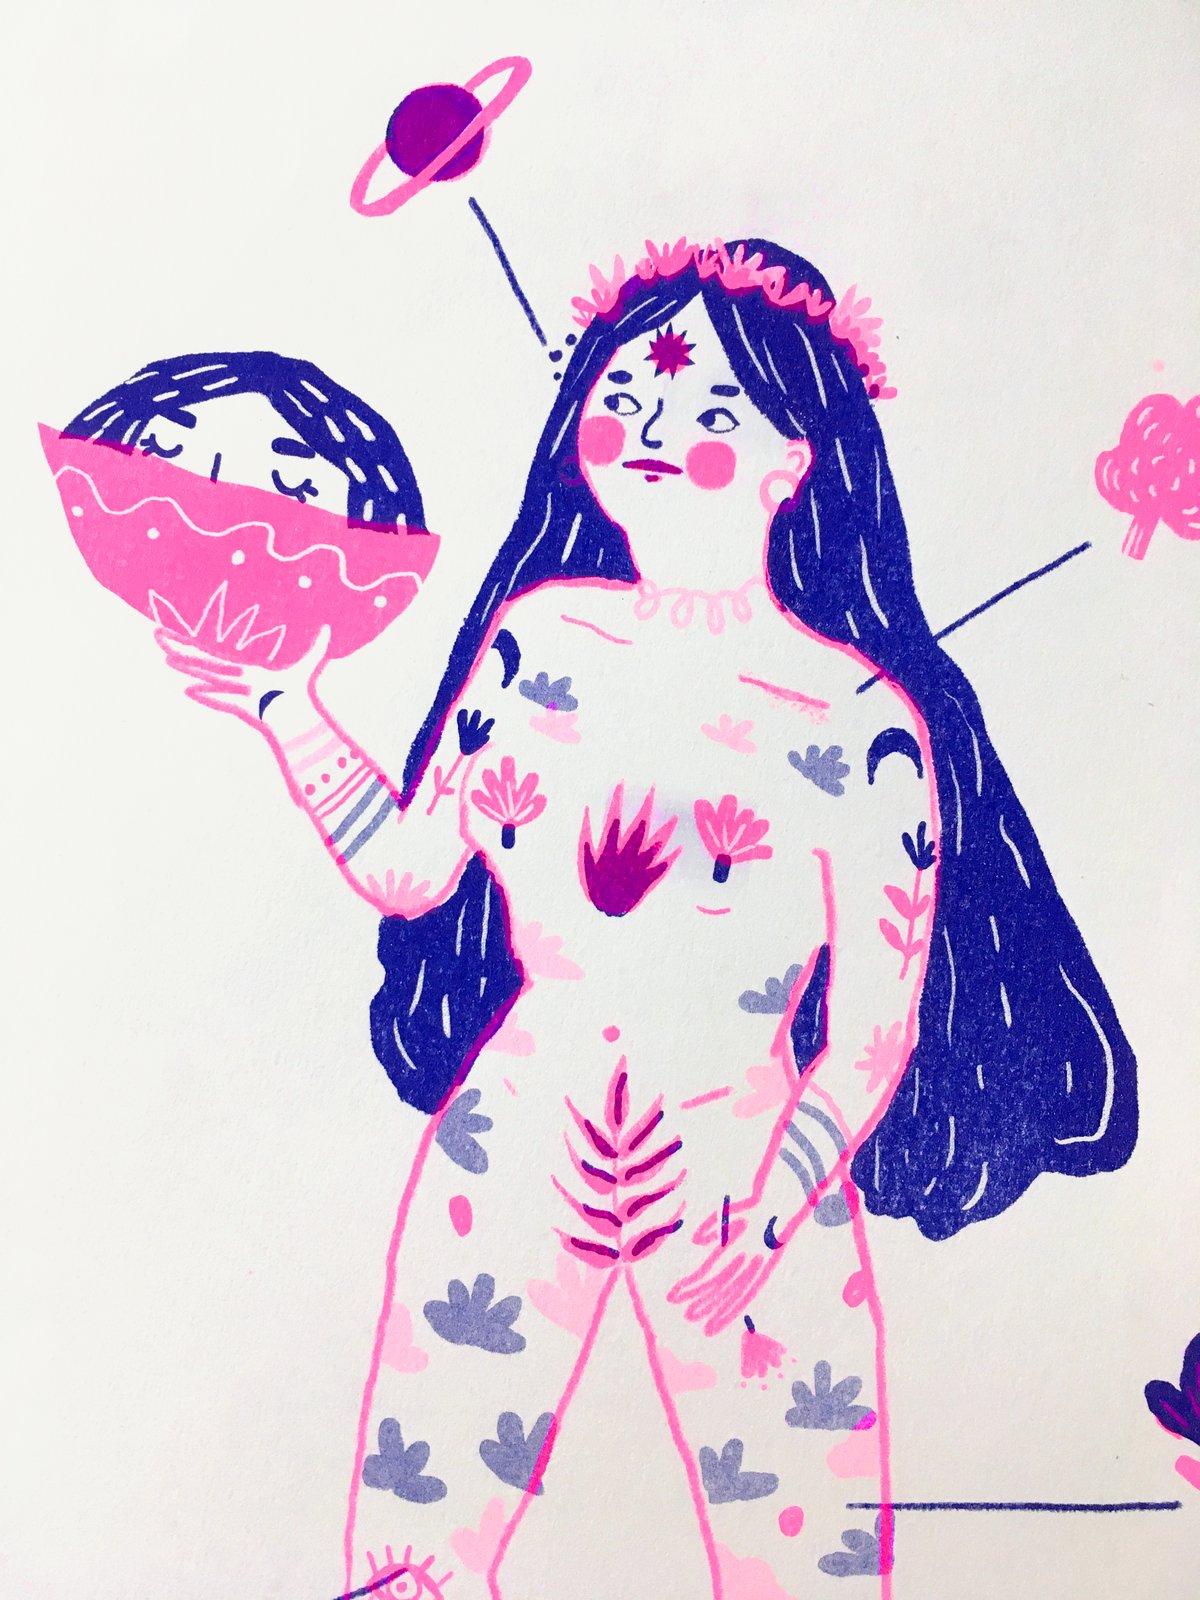 Image of Femme - Victoria Dorche